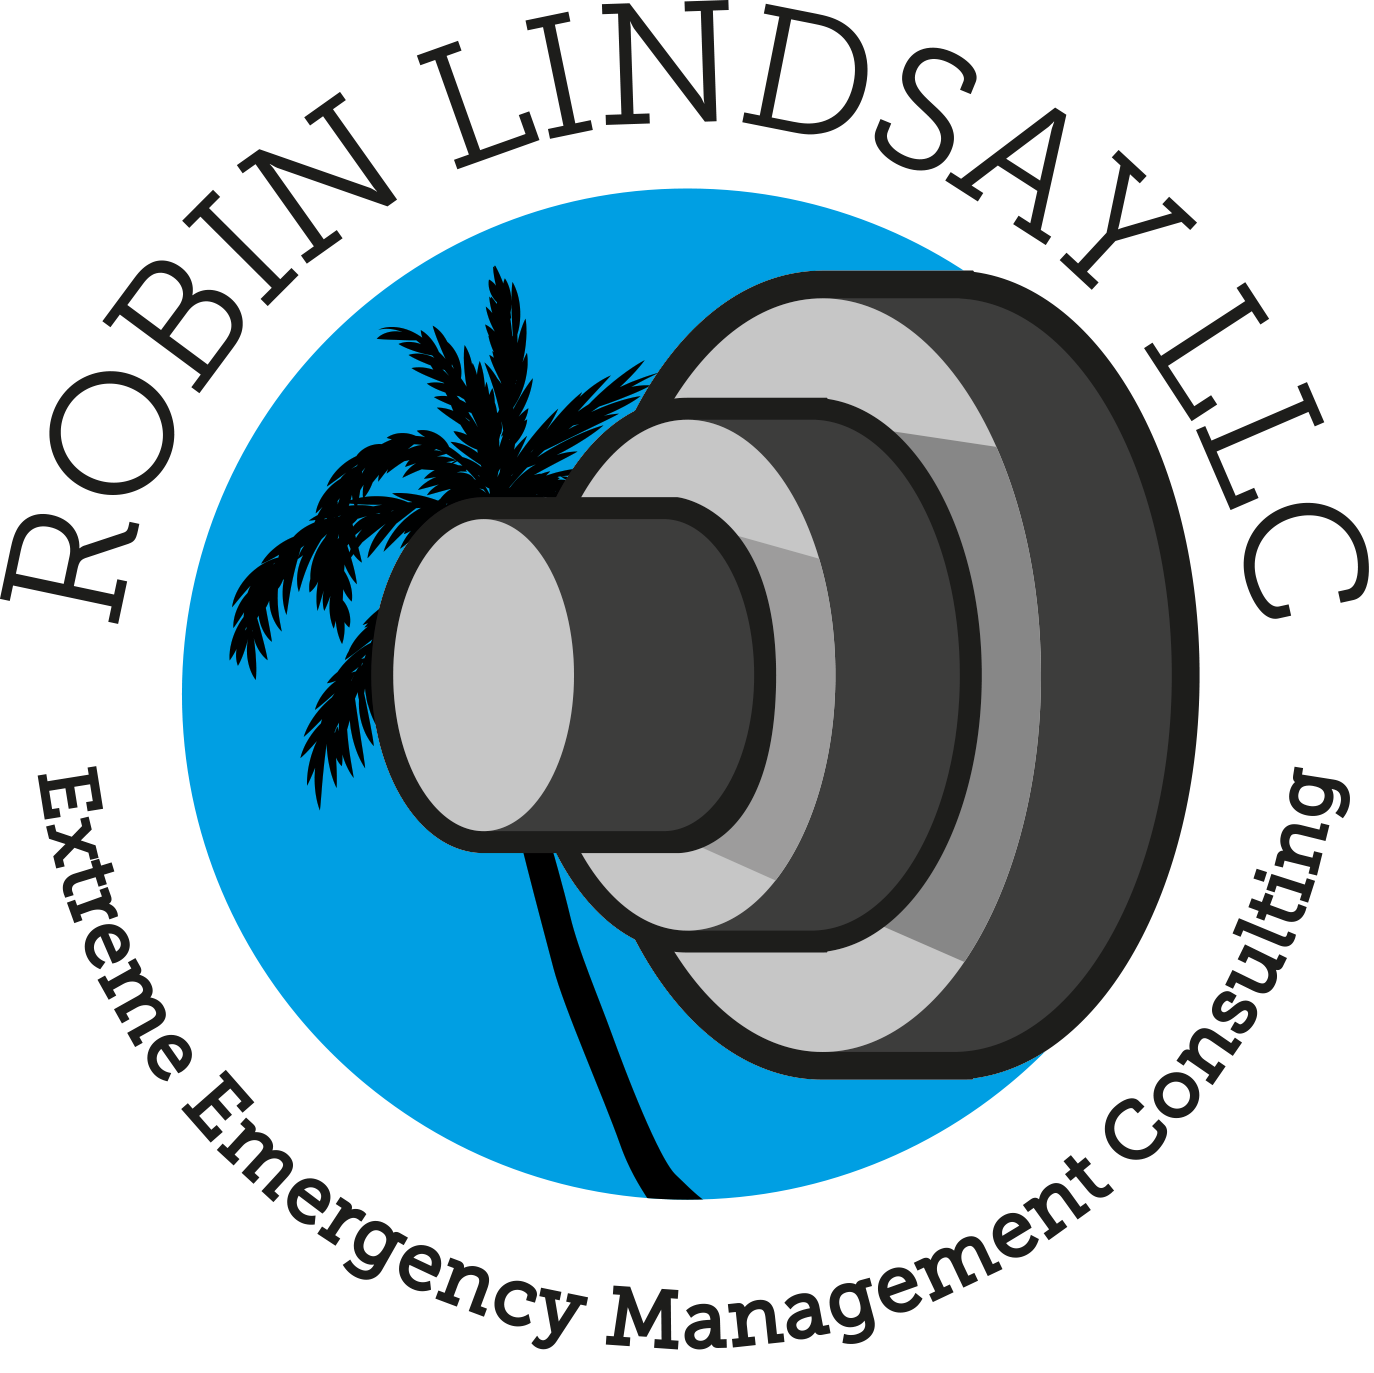 Robin Lindsay LLC